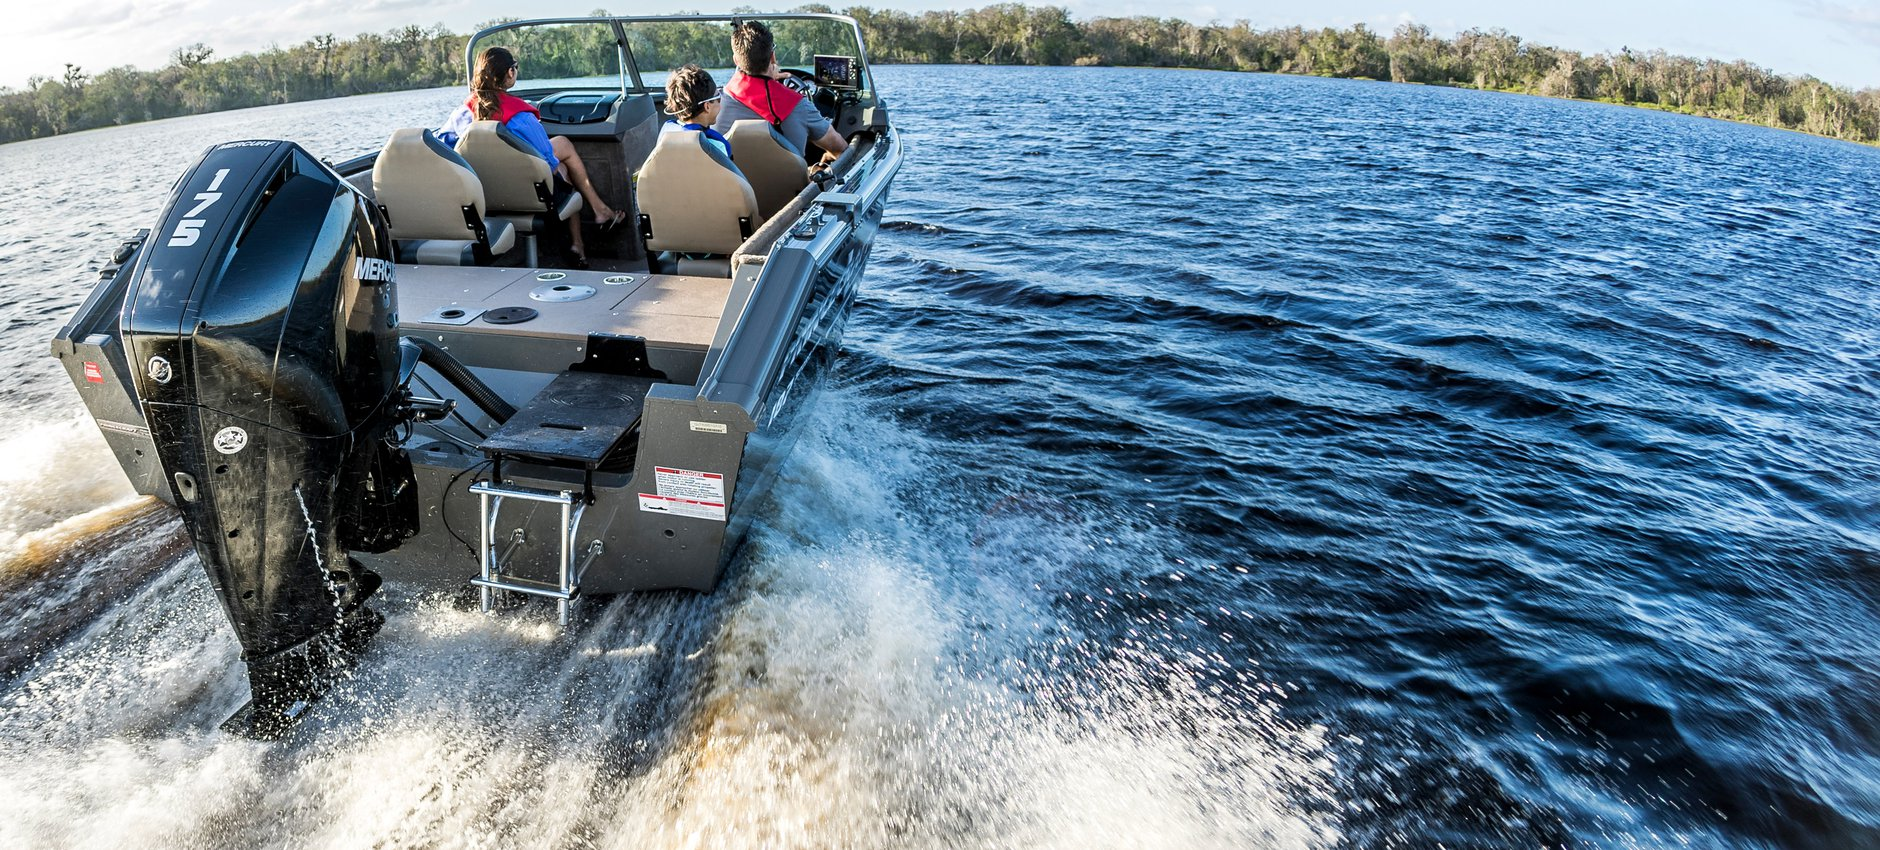 Mercury Outboard Motors on the water in Taylor, MI